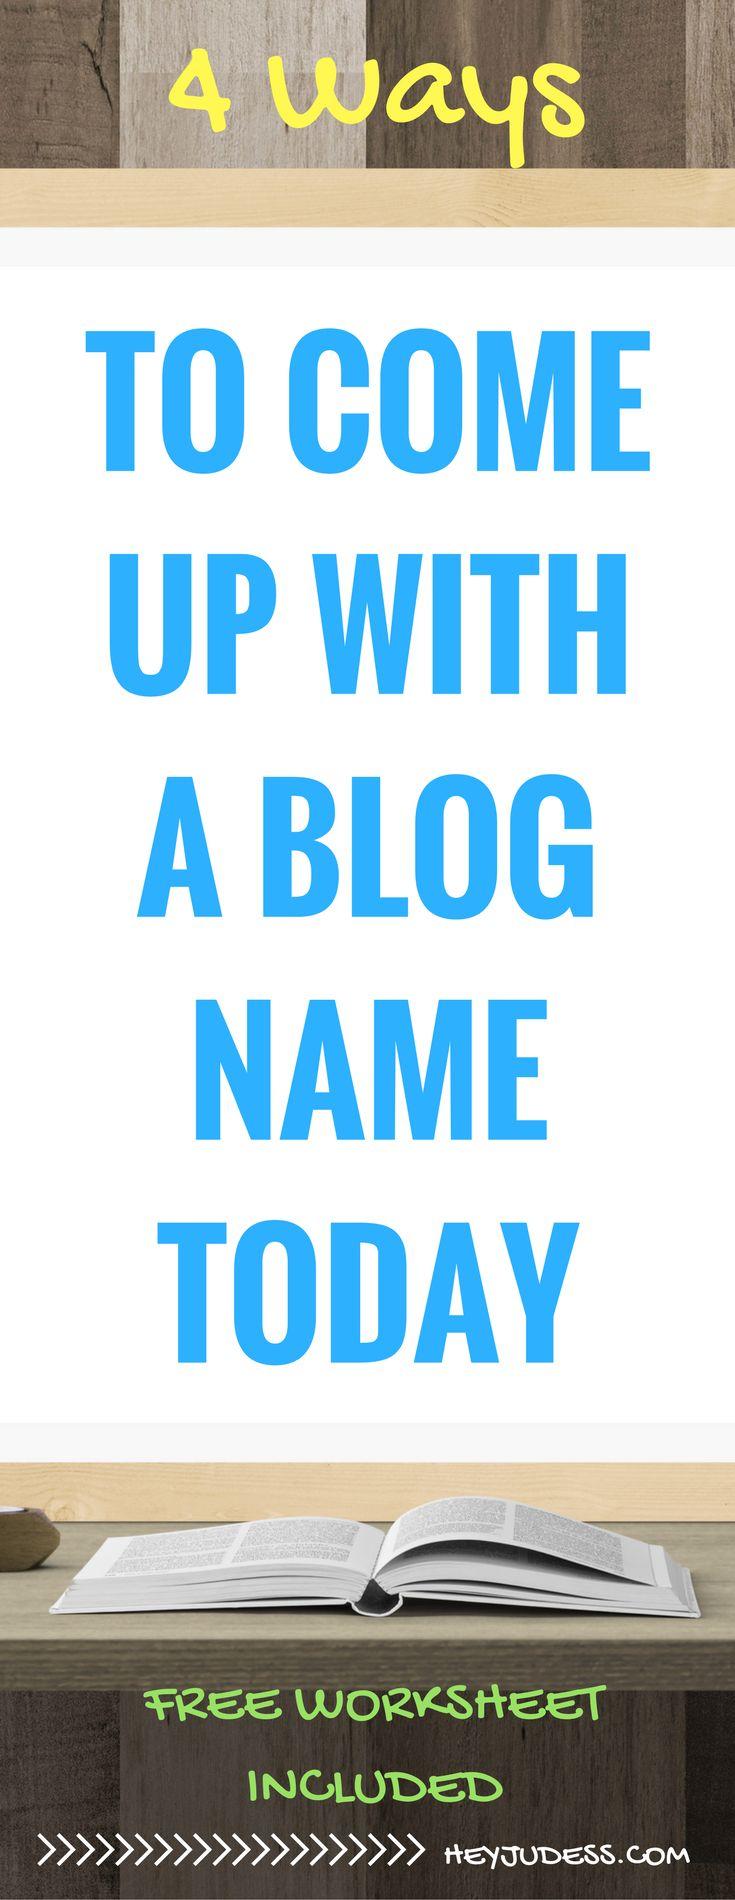 Best 25 Catchy Names Ideas On Pinterest Creative Blog - MVlC